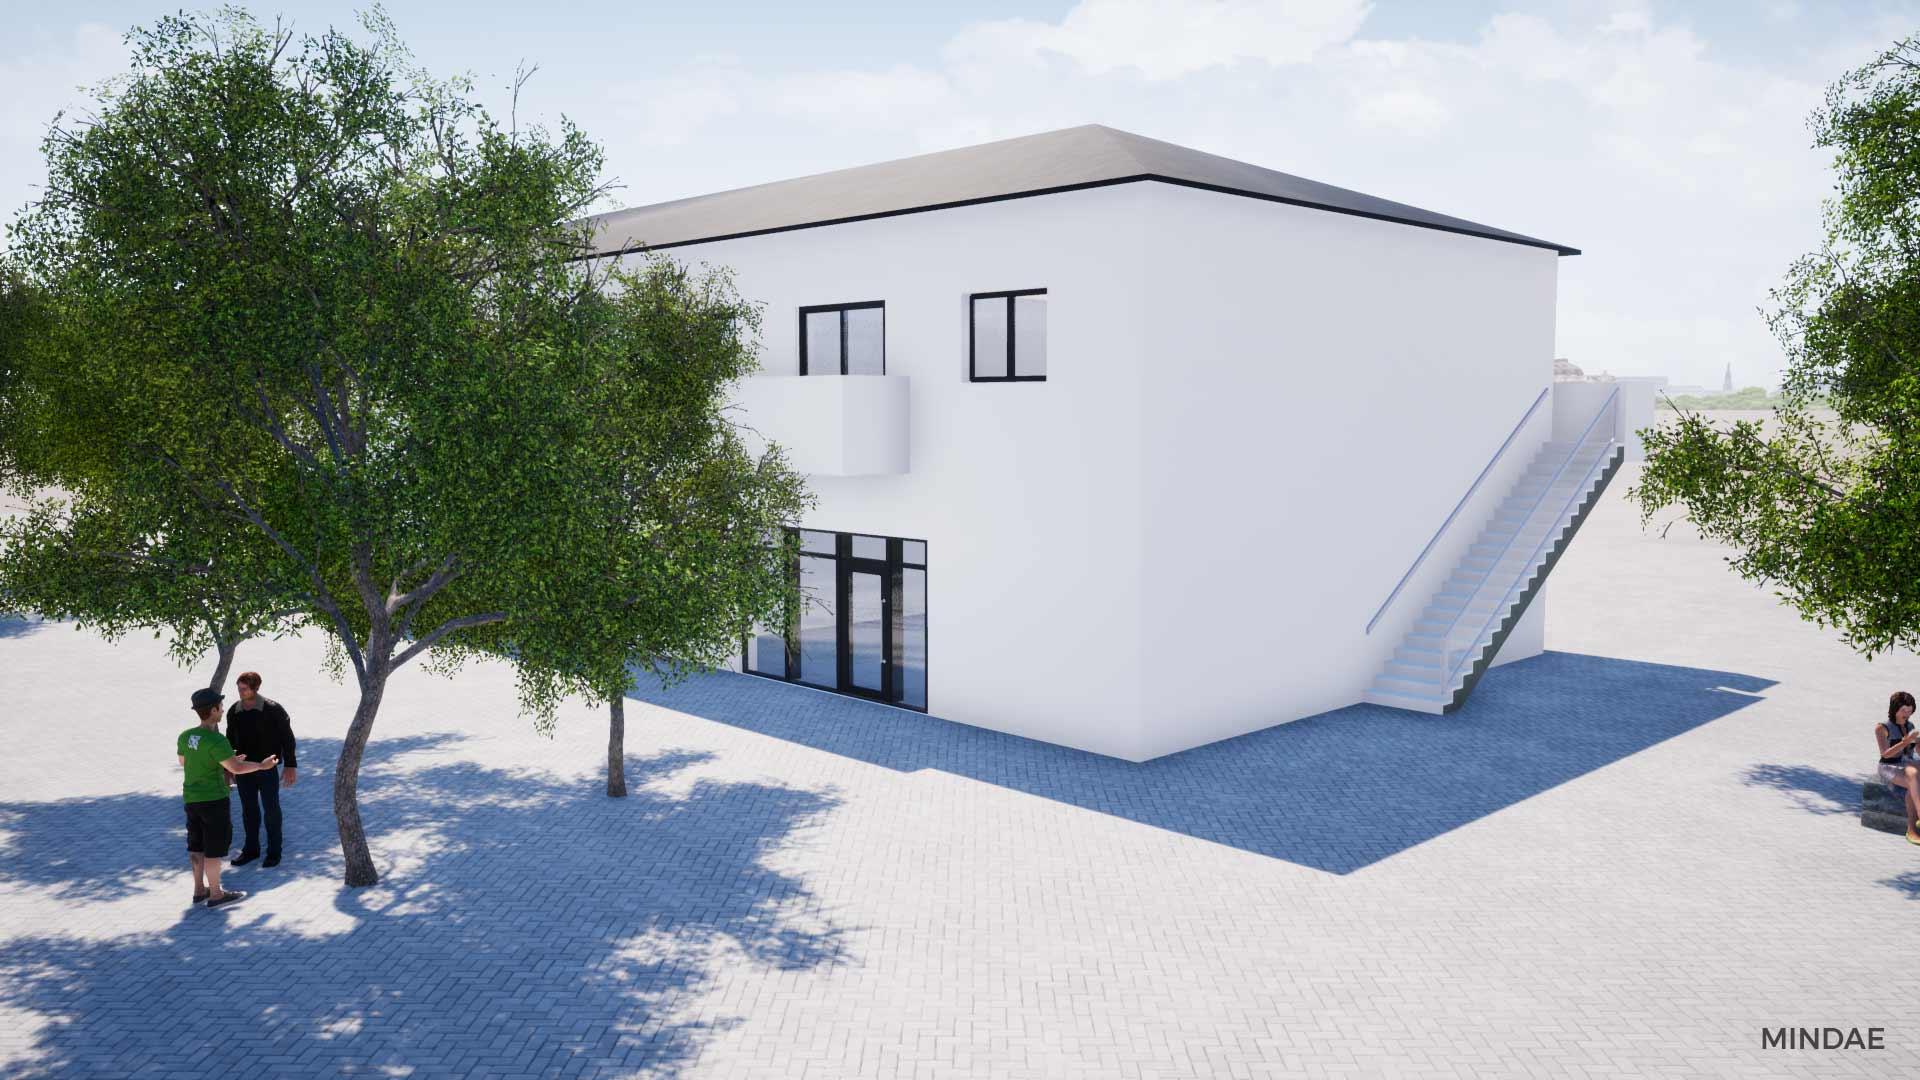 Mindae_immeuble_parapharmacie_devanture_enseigne_3D_facade-(2)